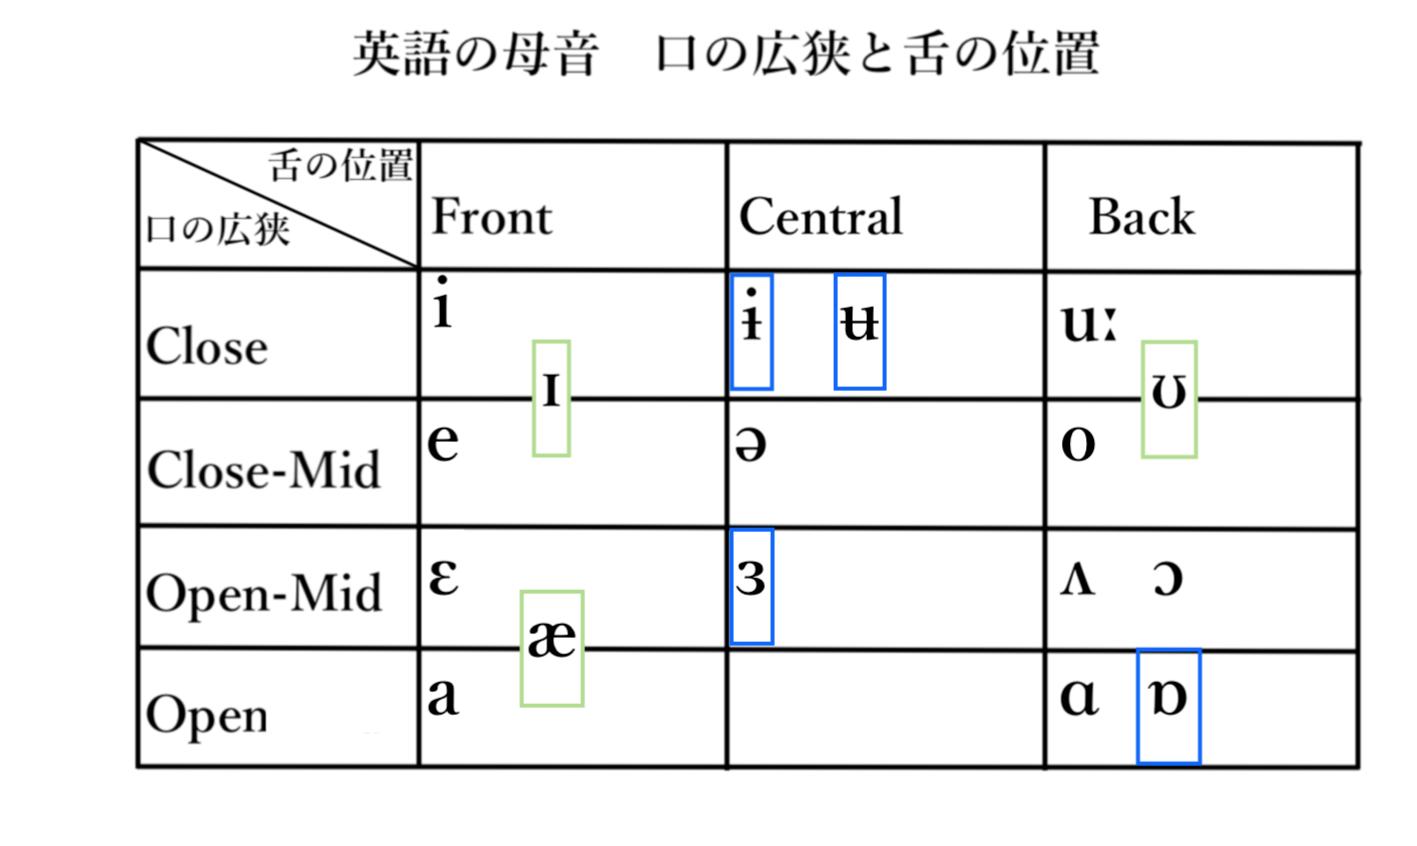 IPA母音の発音記号を参考にした図(筆者作成)